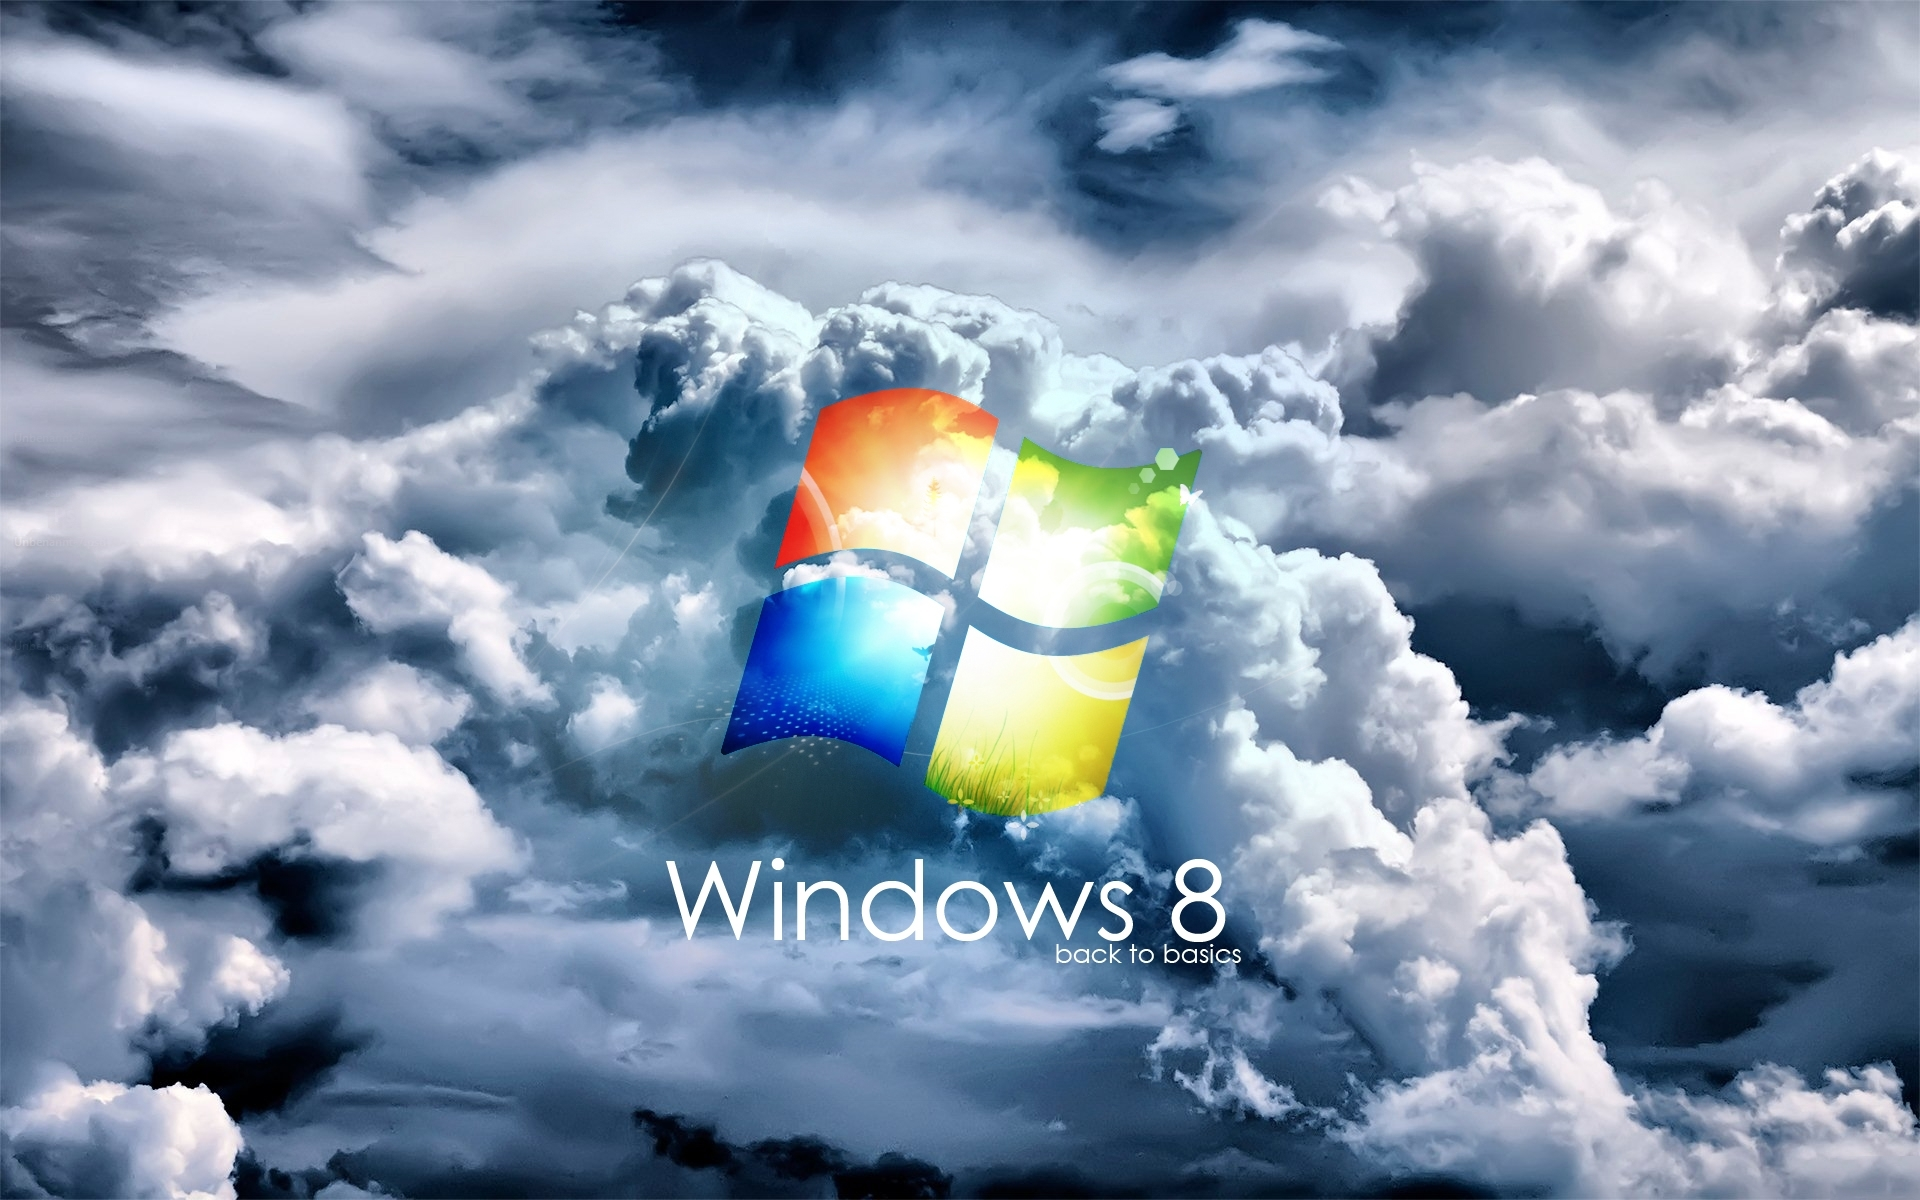 windows 8 wallpapers, windows 8 backgrounds, windows 8 free hd